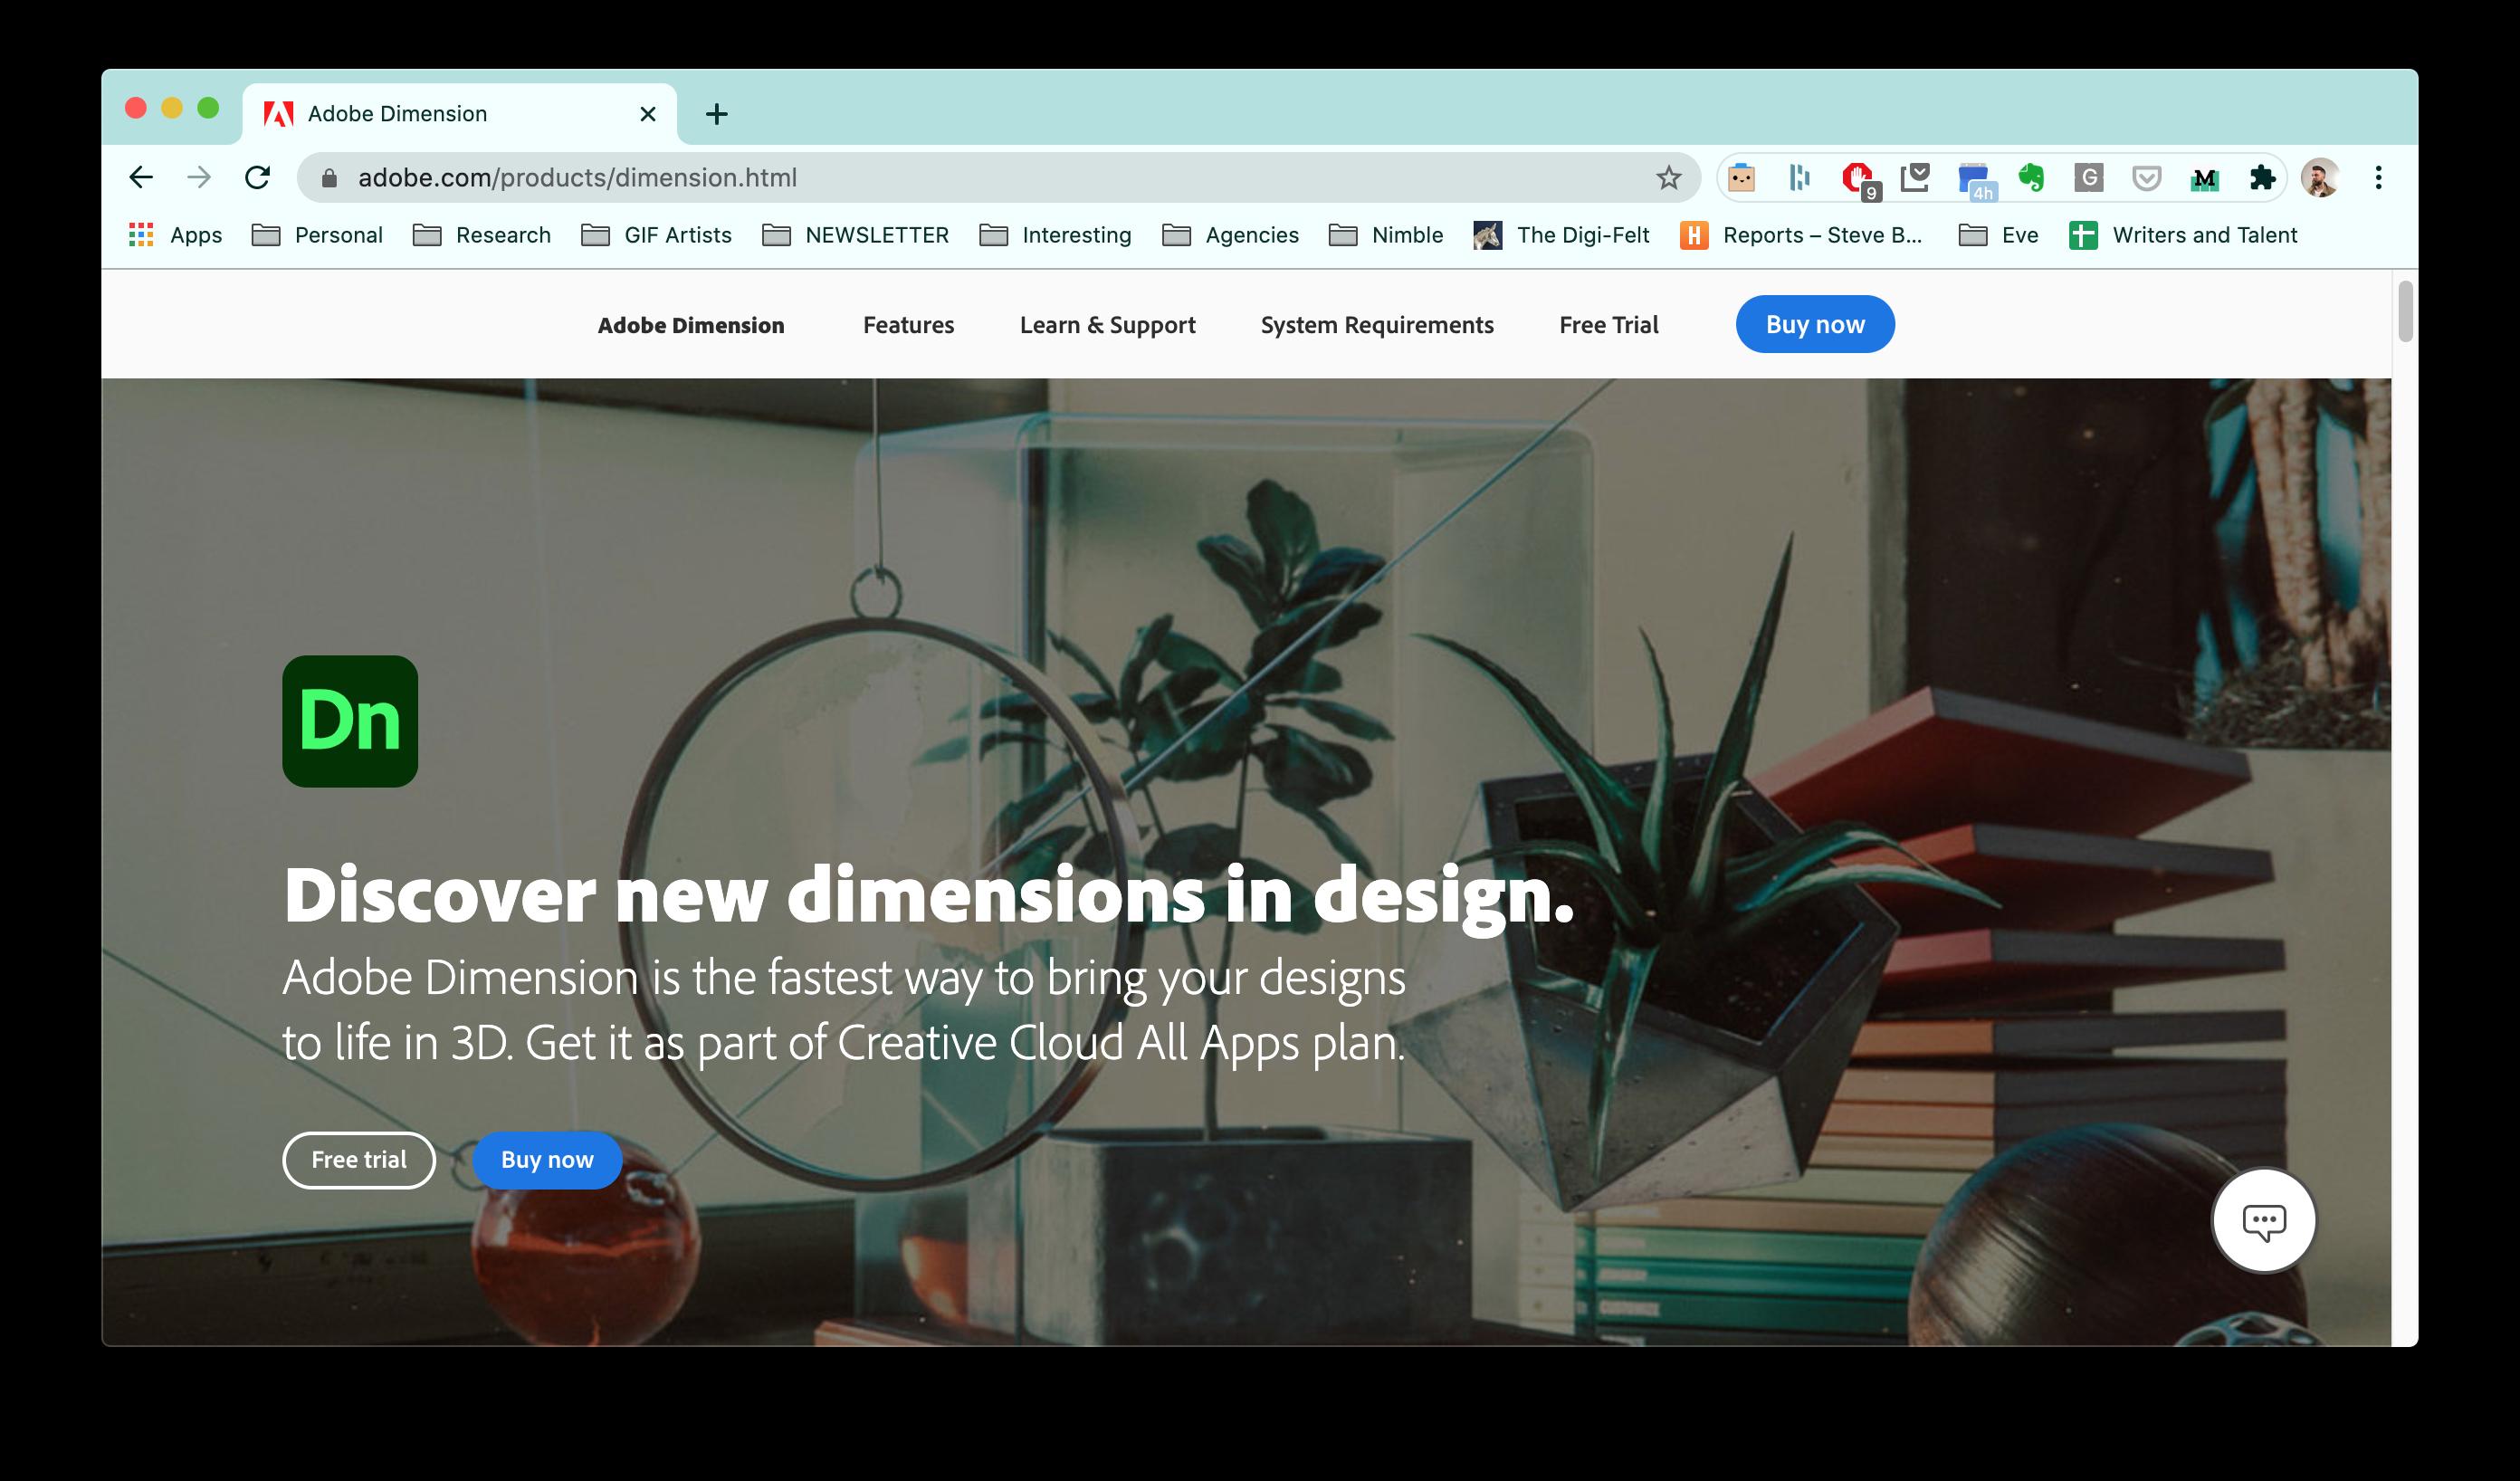 marketing strategy for Adobe Dimension